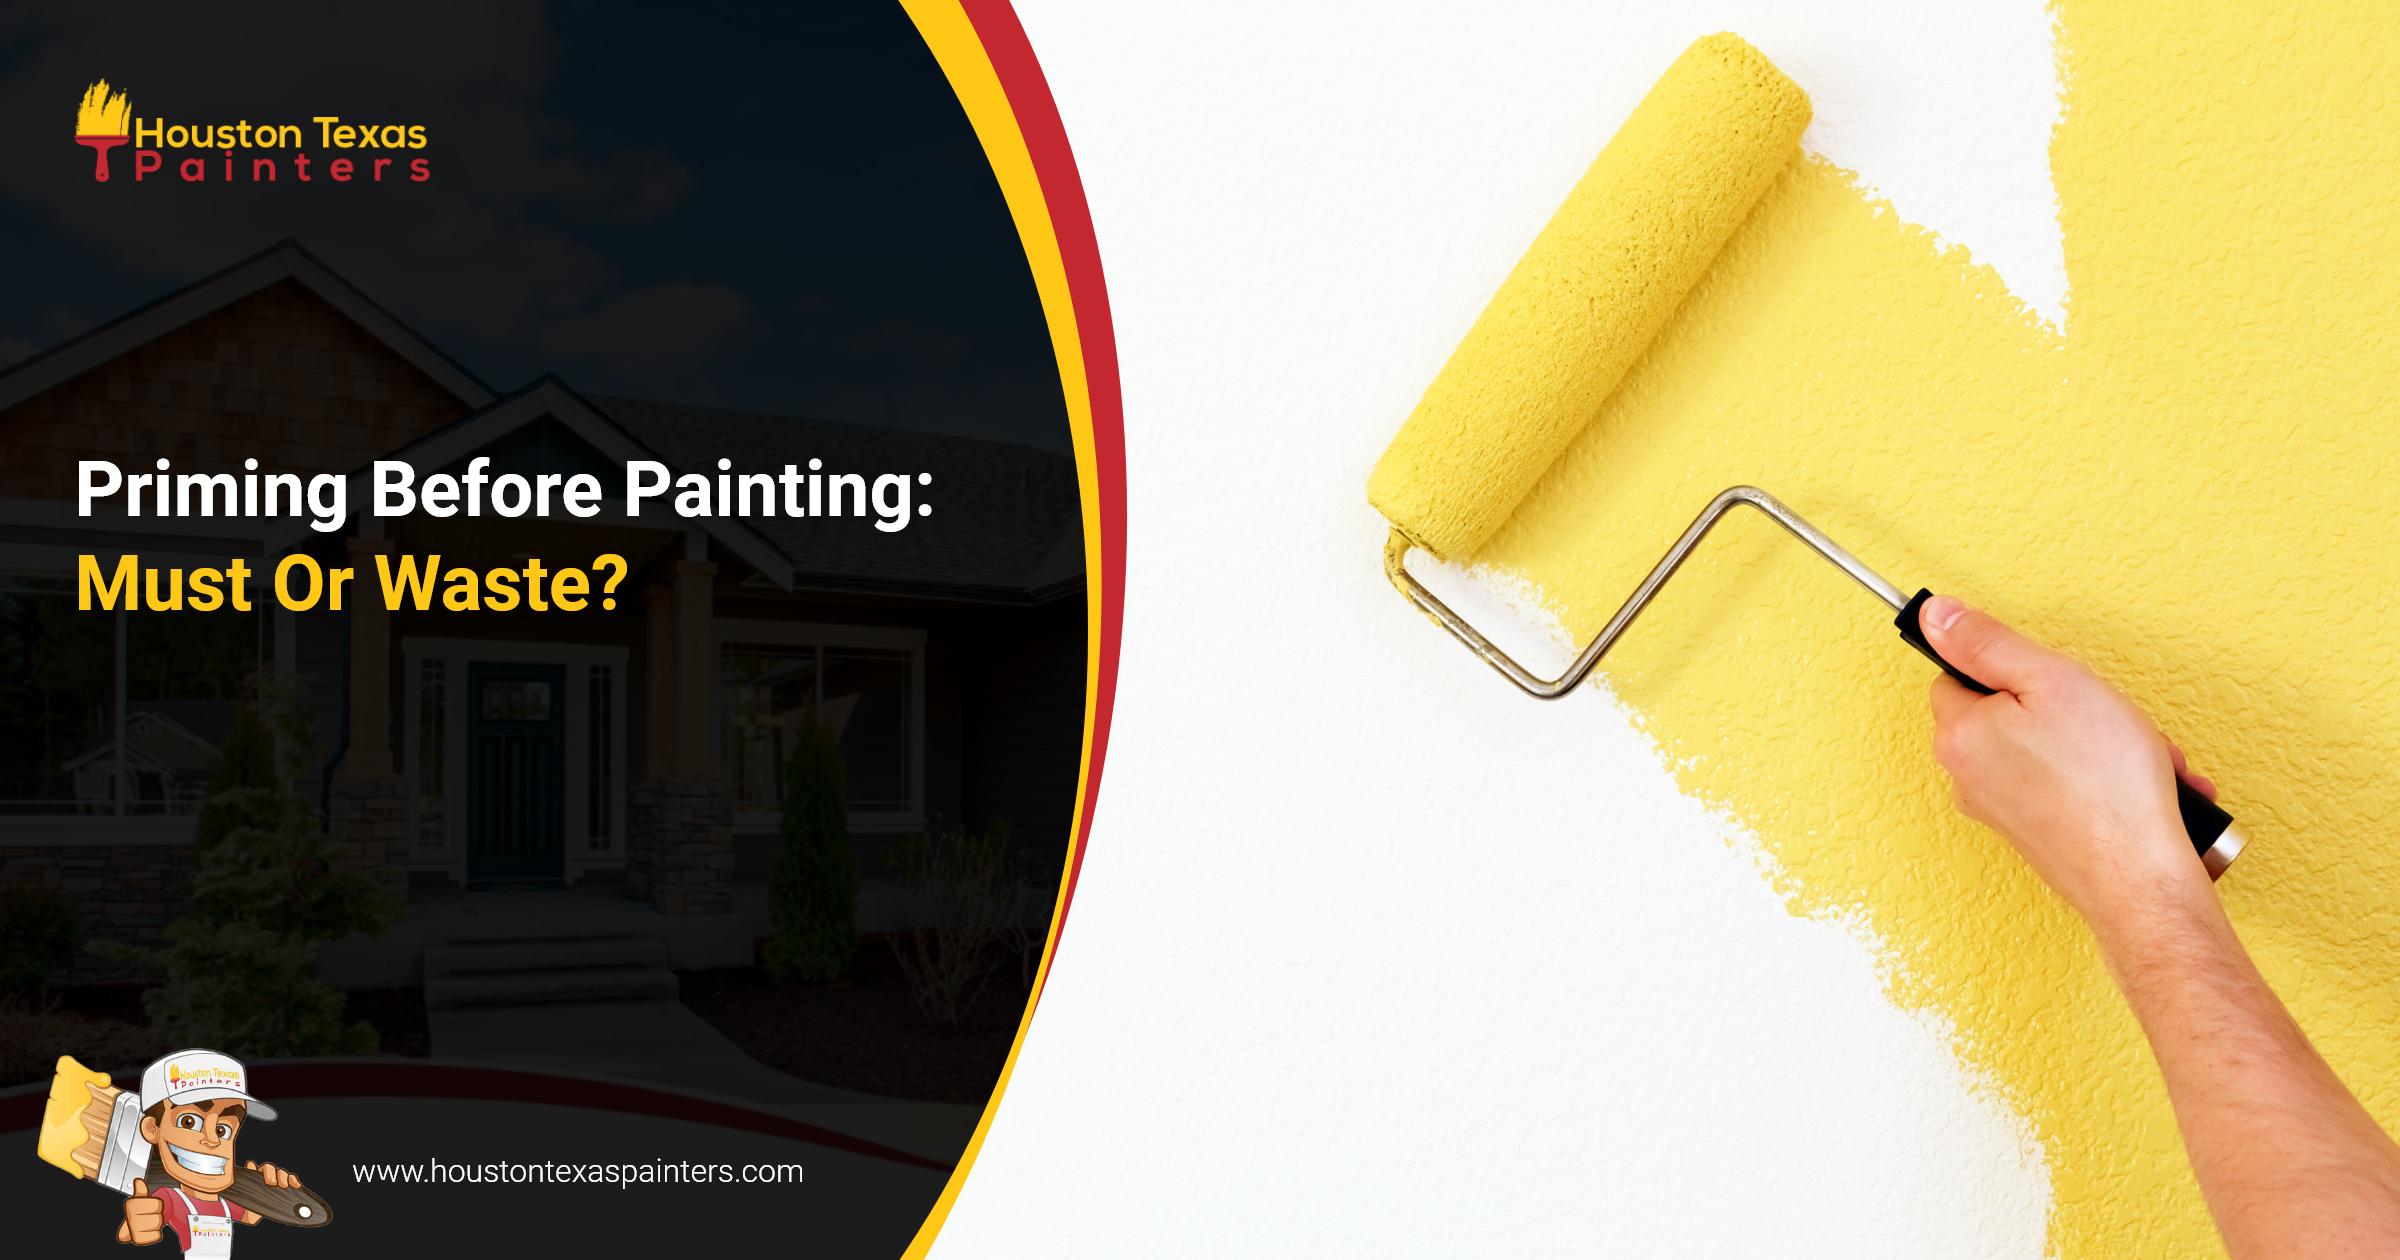 Priming Before Painting: Must Or Waste?